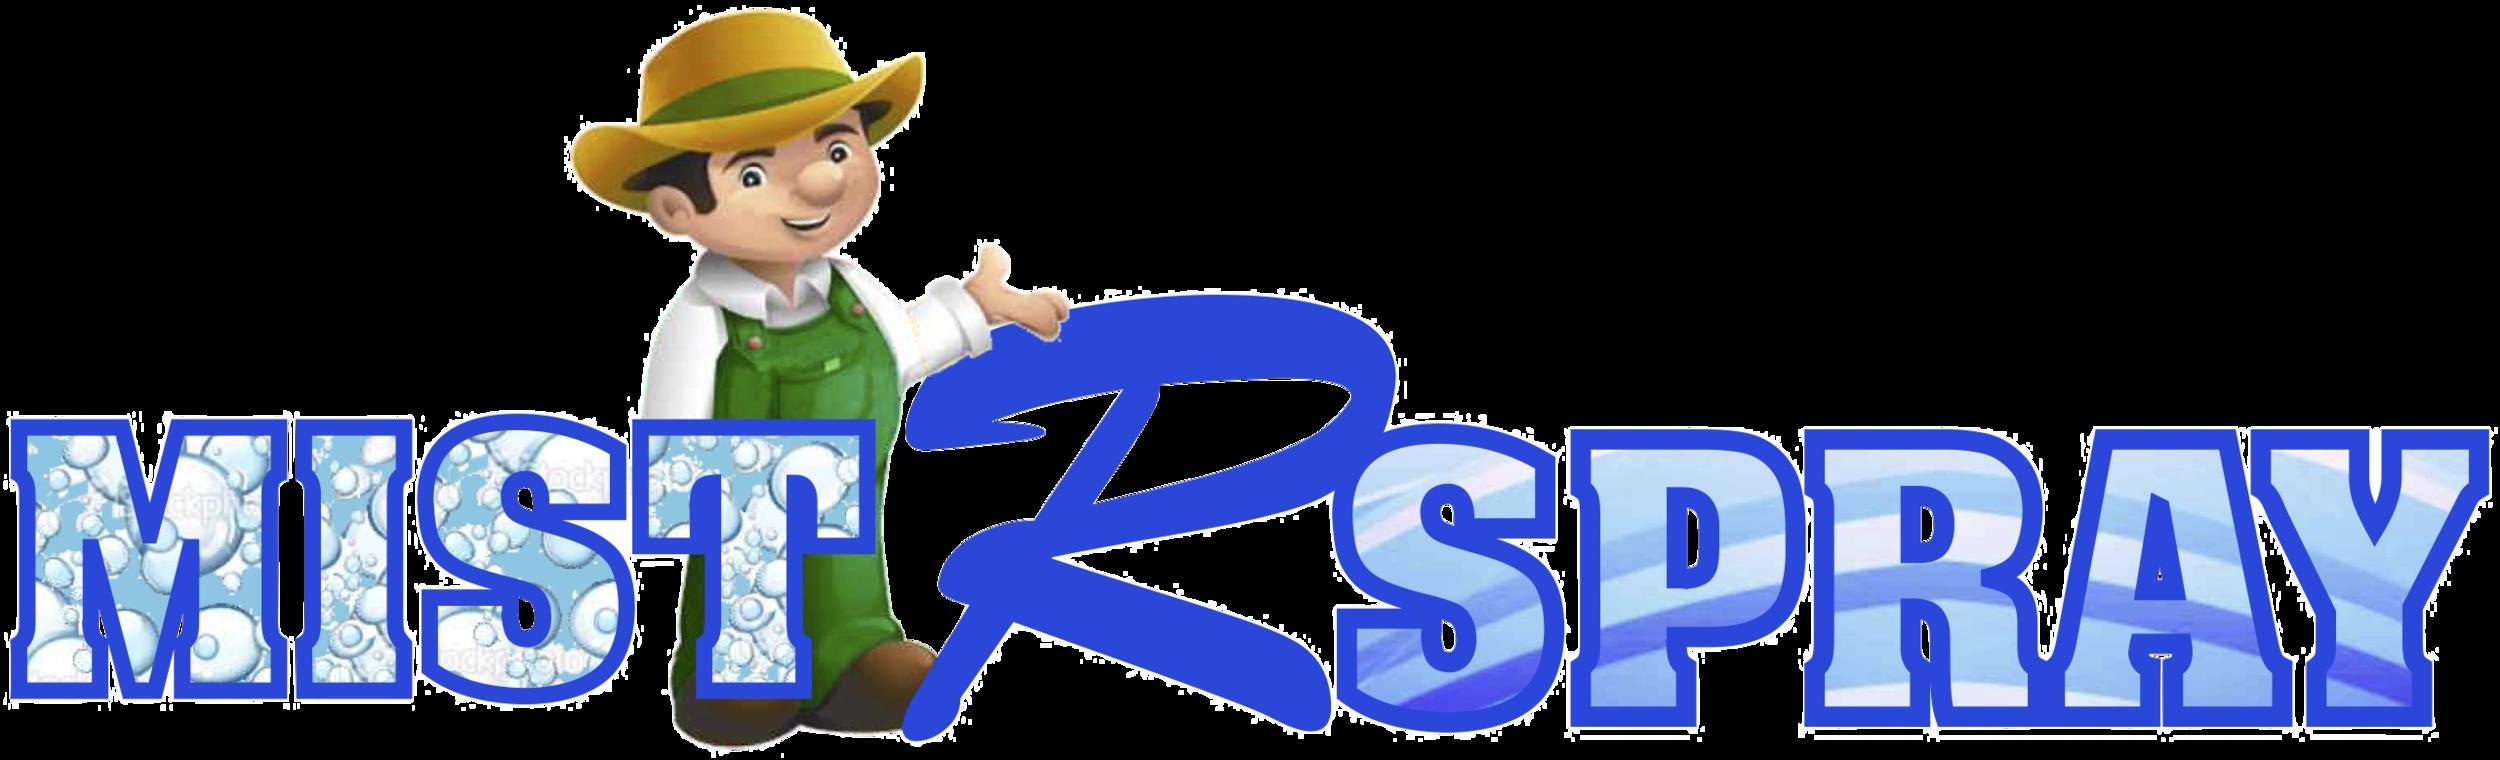 mistRspray color logo.png